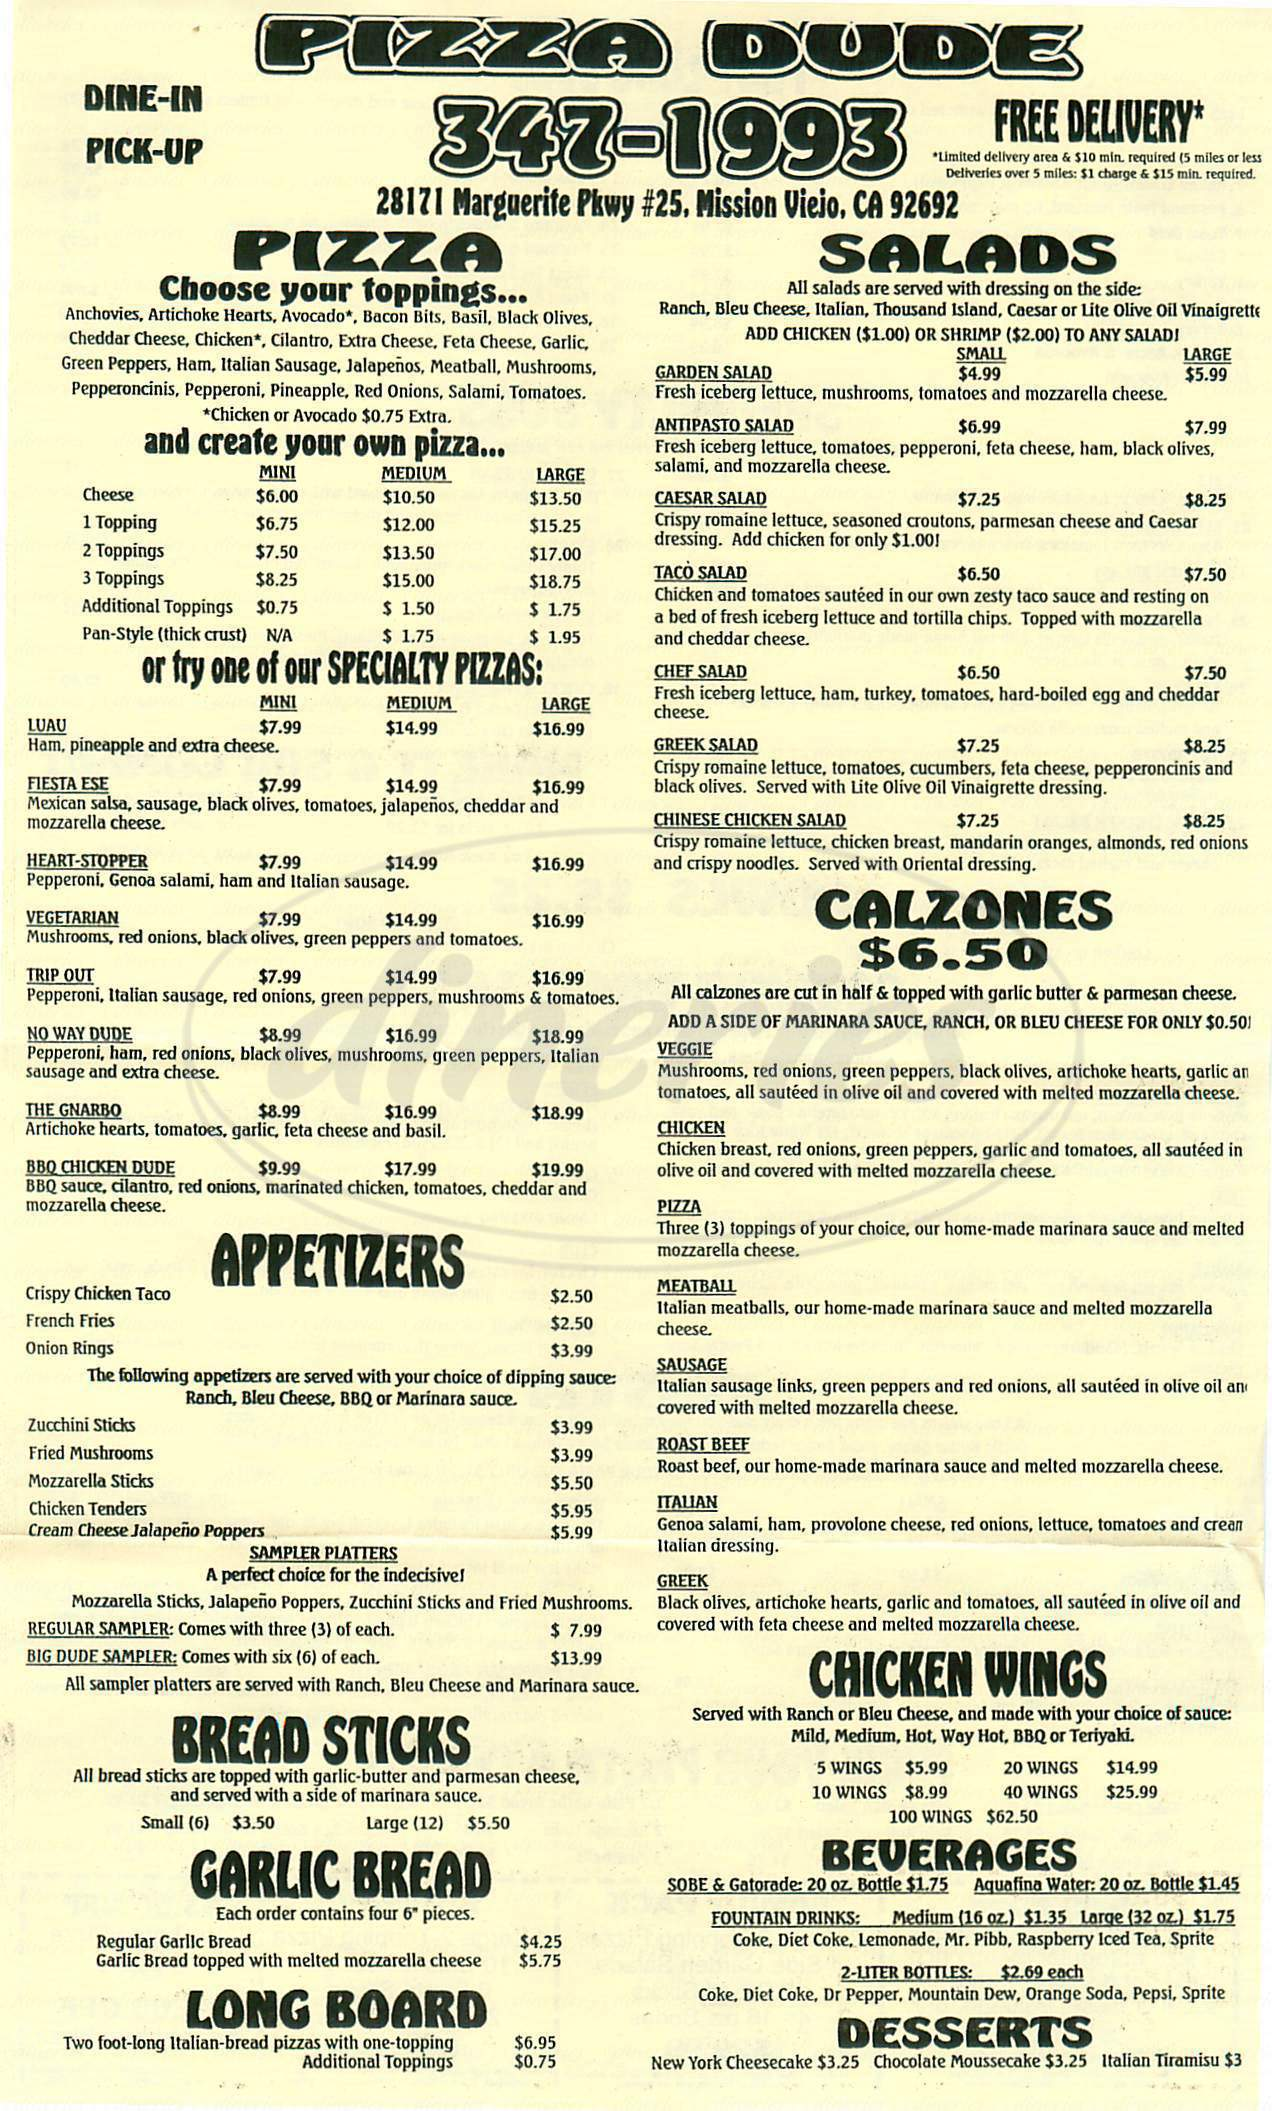 menu for Pizza Dude